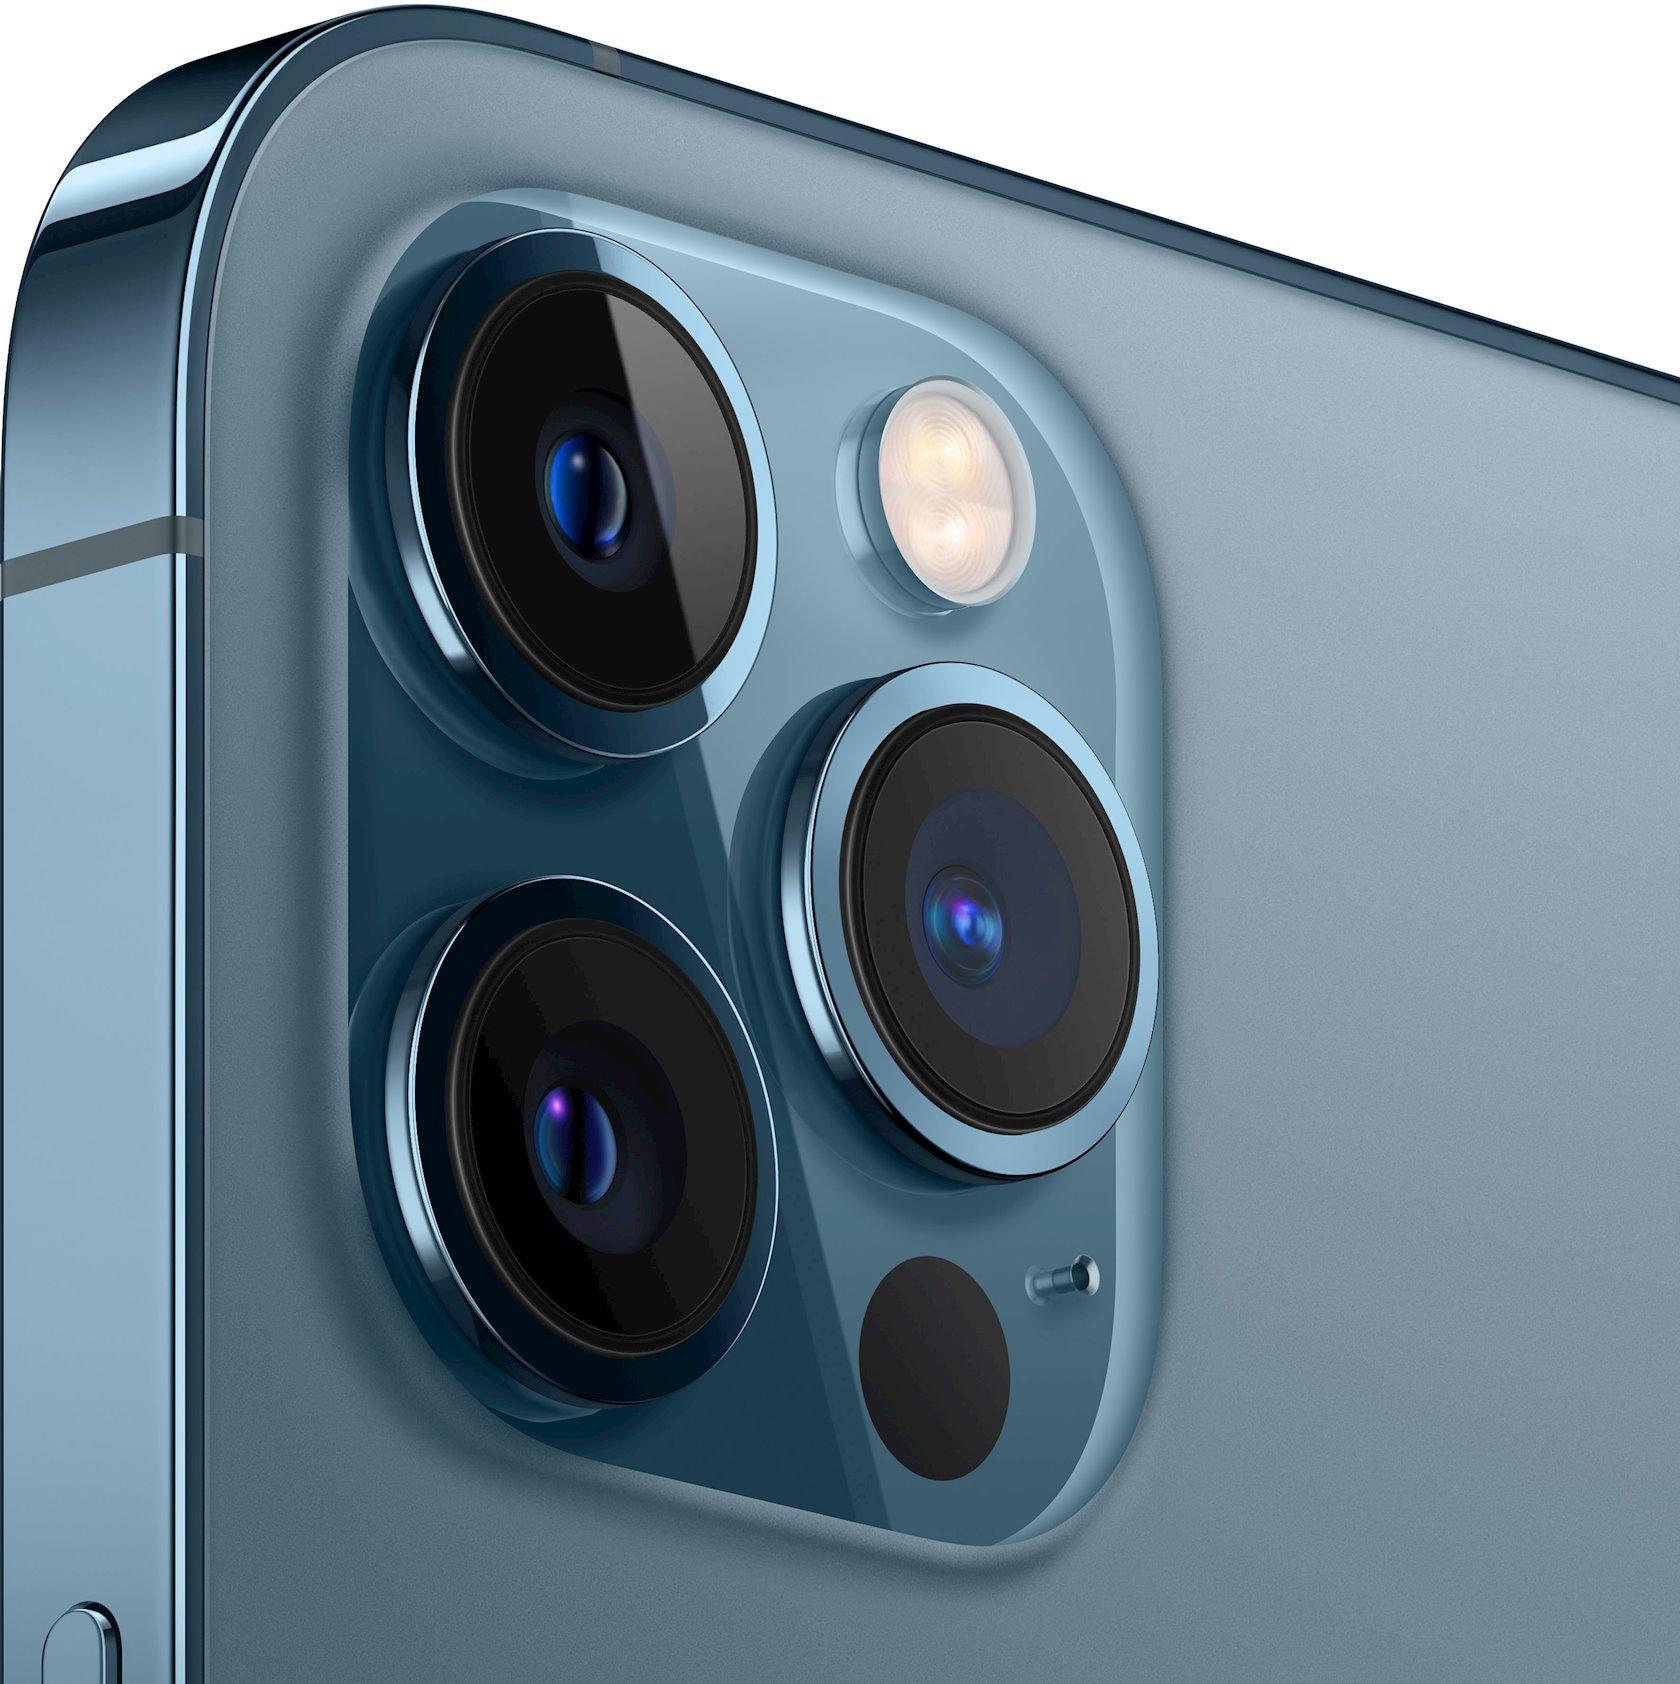 Smartfon Apple iPhone 12 Pro Max 6GB/256G B Pacific Blue